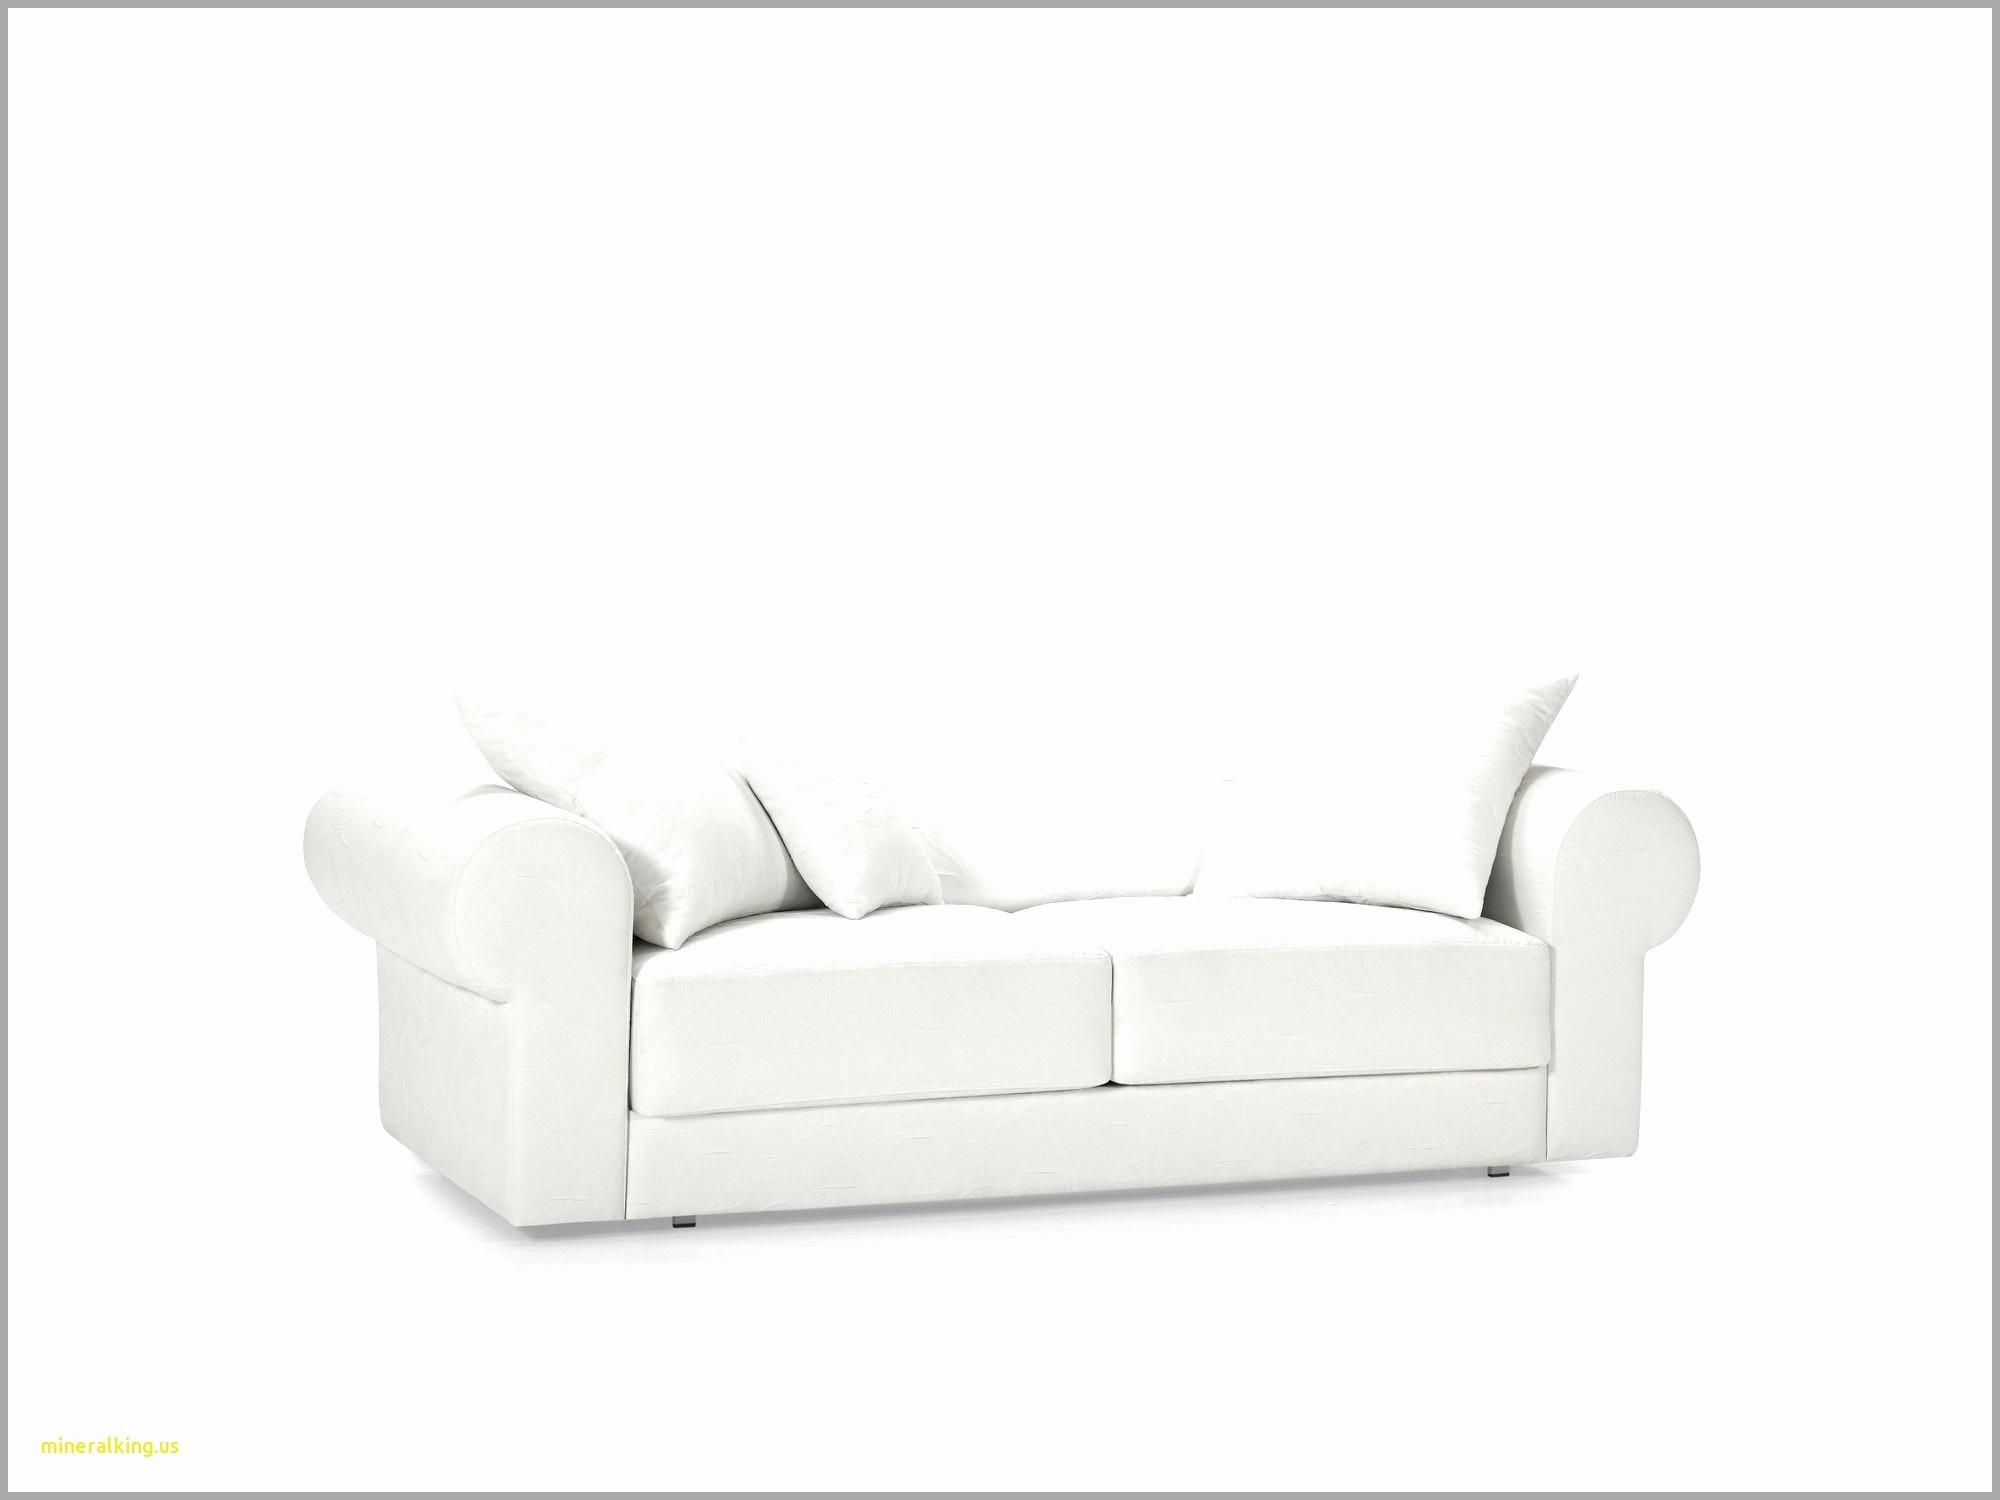 Canapé Convertible Cuir Conforama Frais Images Canap Blanc Good Canape D Angle Places Avec Canap N to Madrid Gris